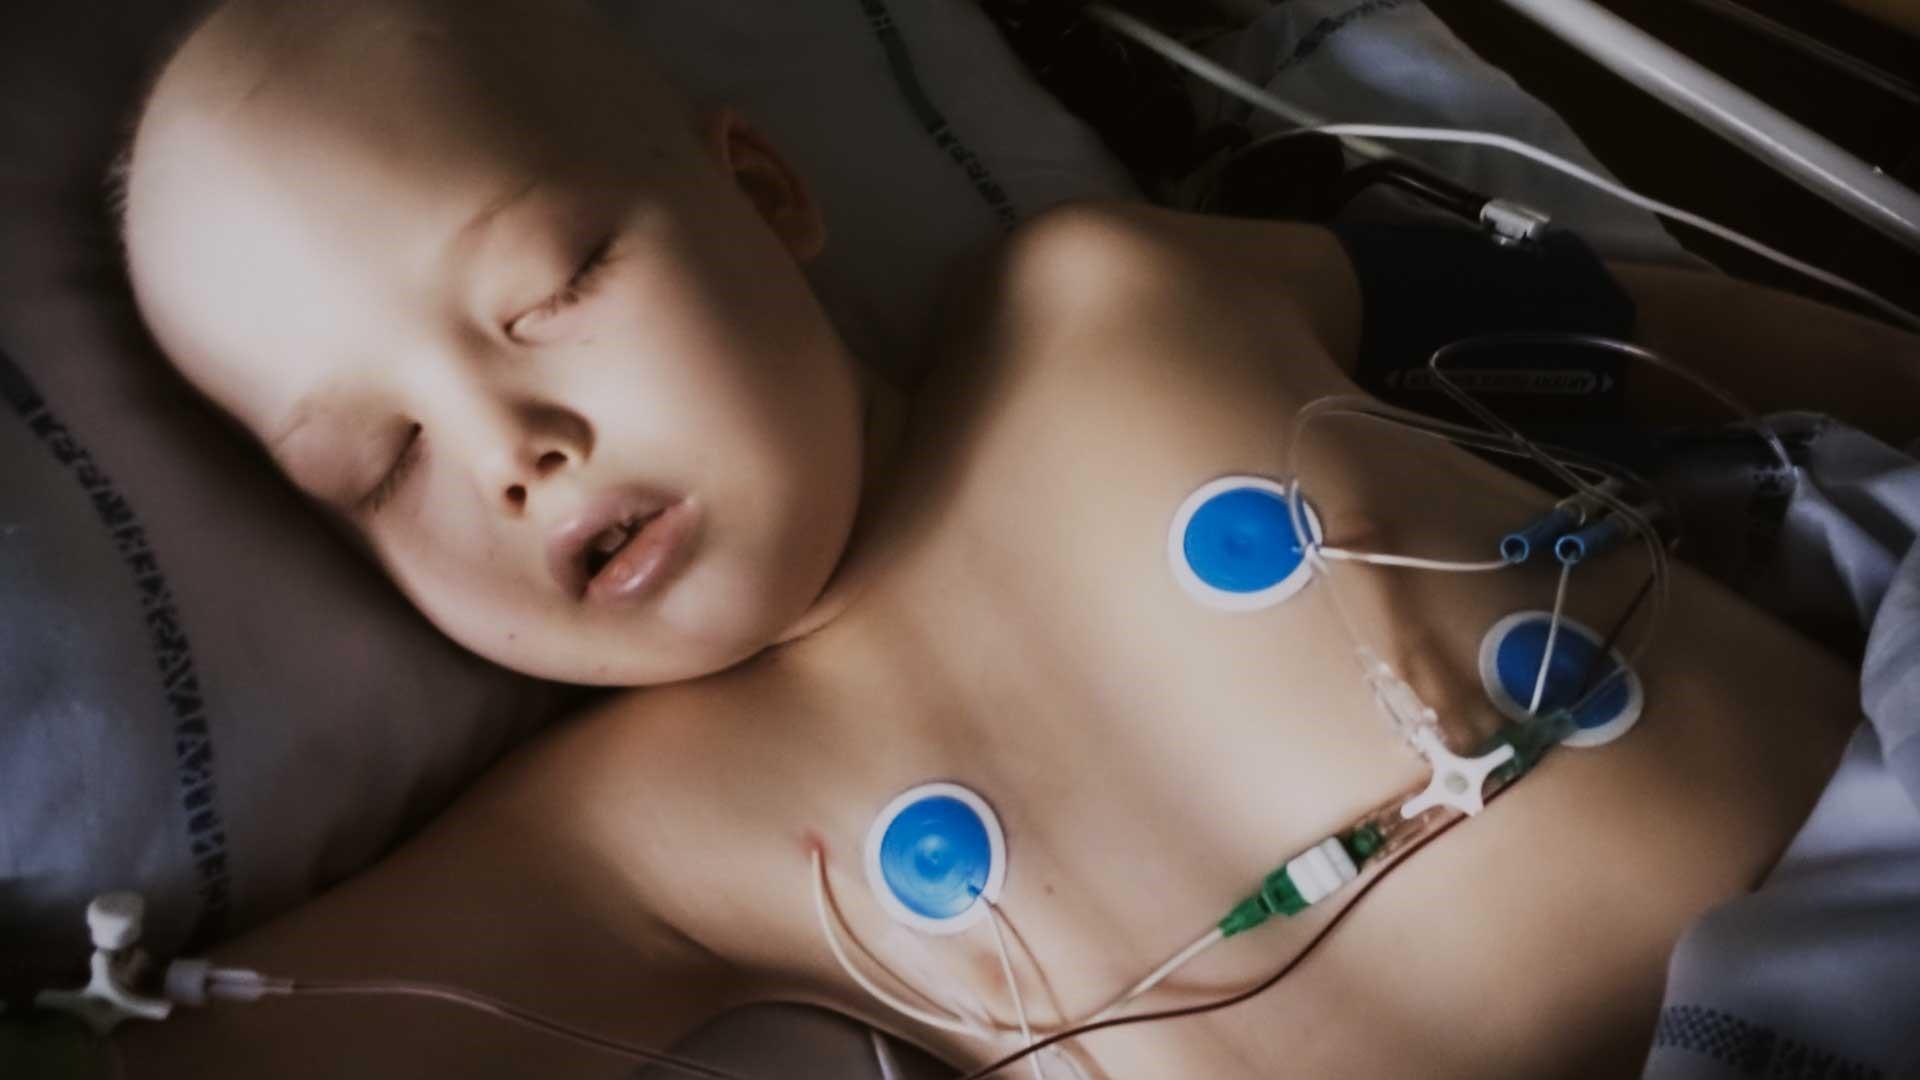 Gilbert var otte år og skulle igennem 900 dage med kemo